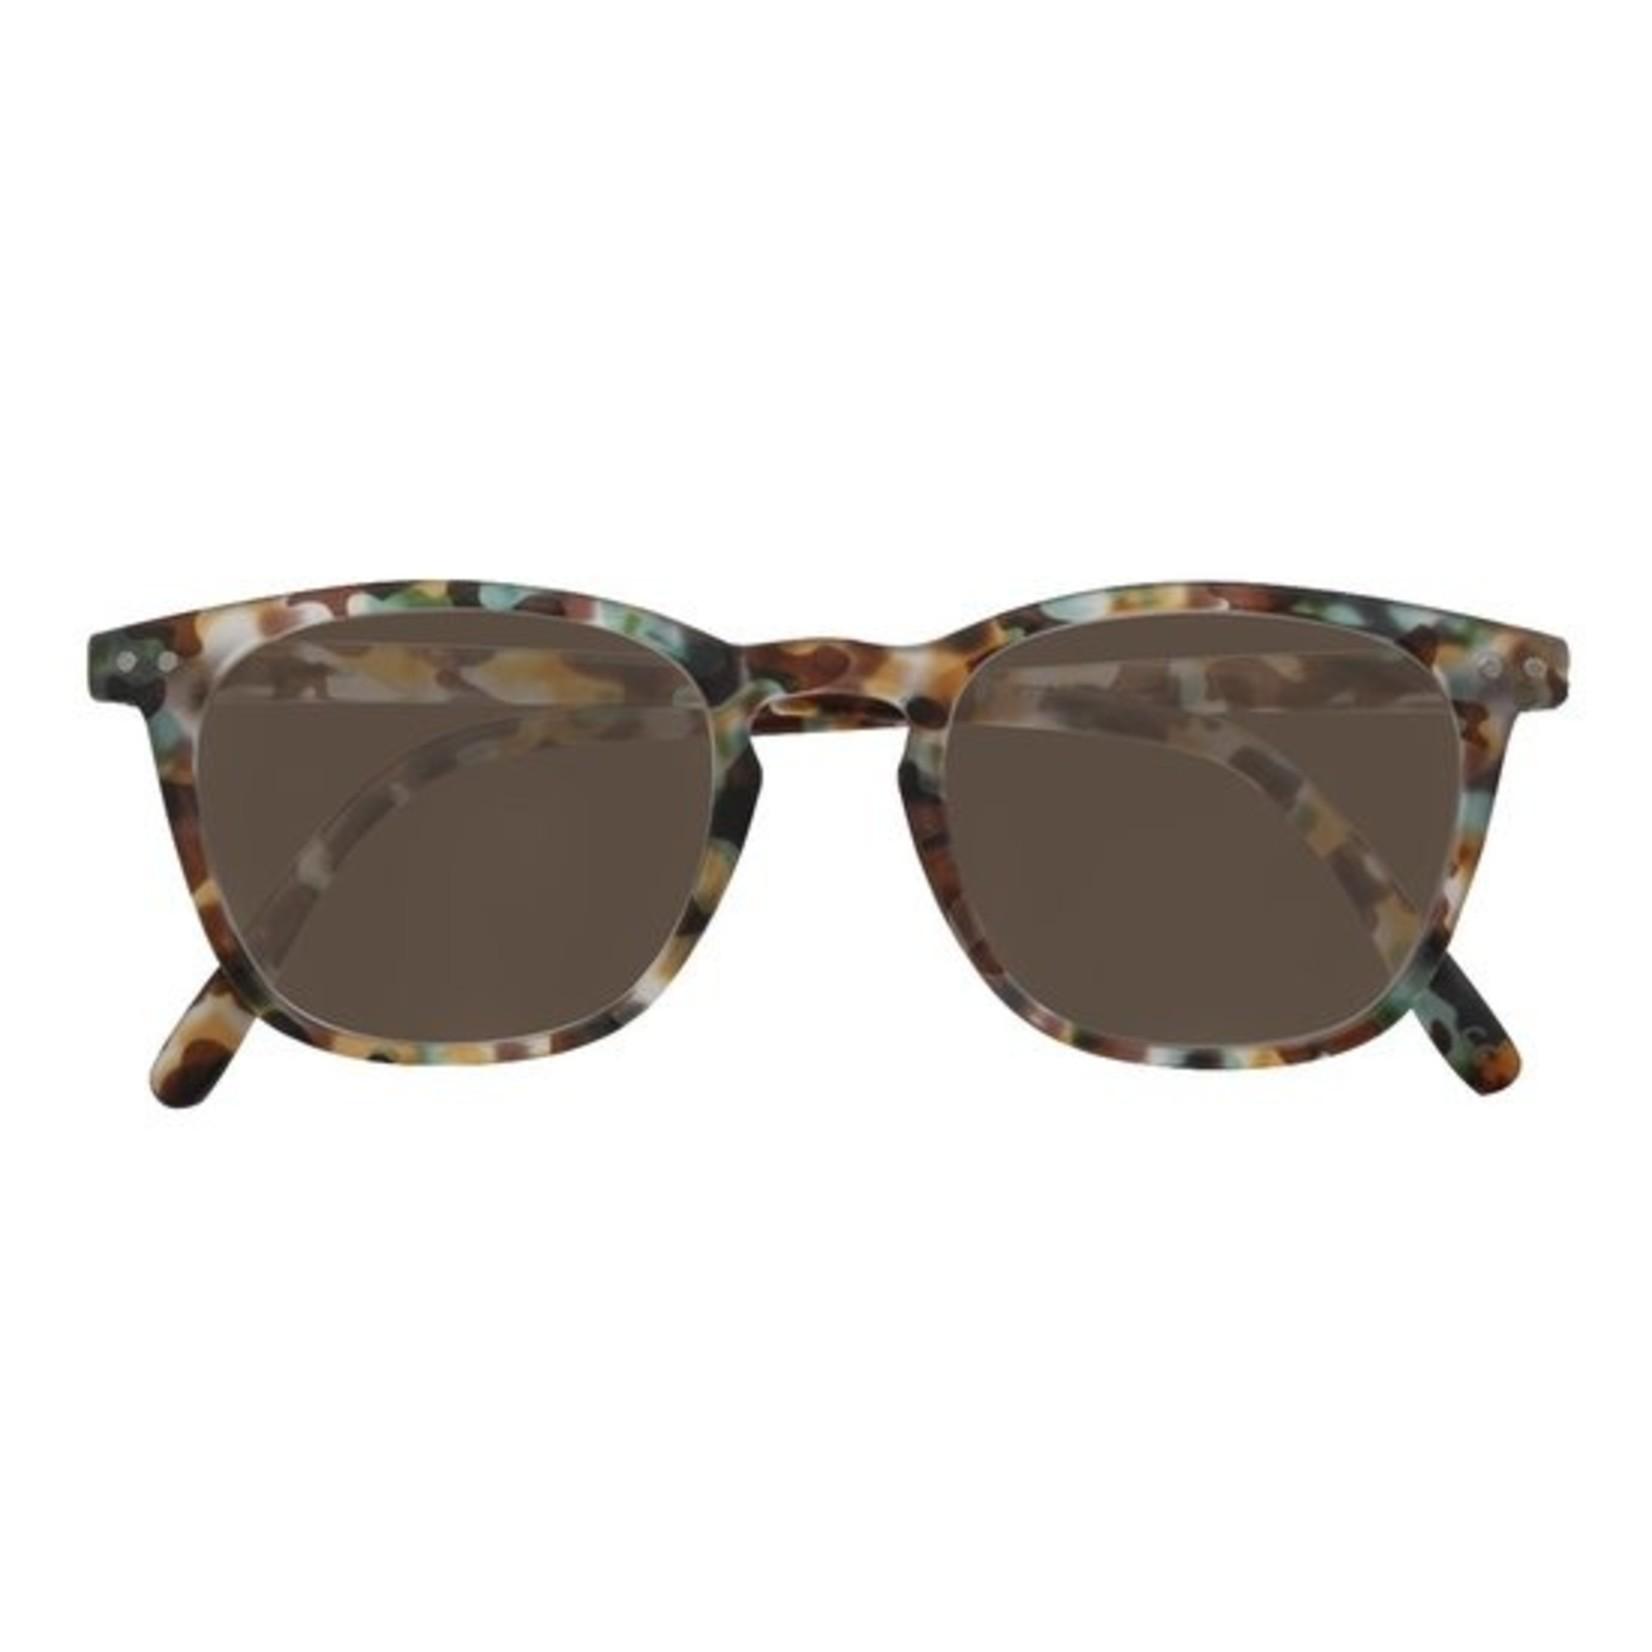 Croon Ann Satin Gold/Green zonnebril pilotenbril